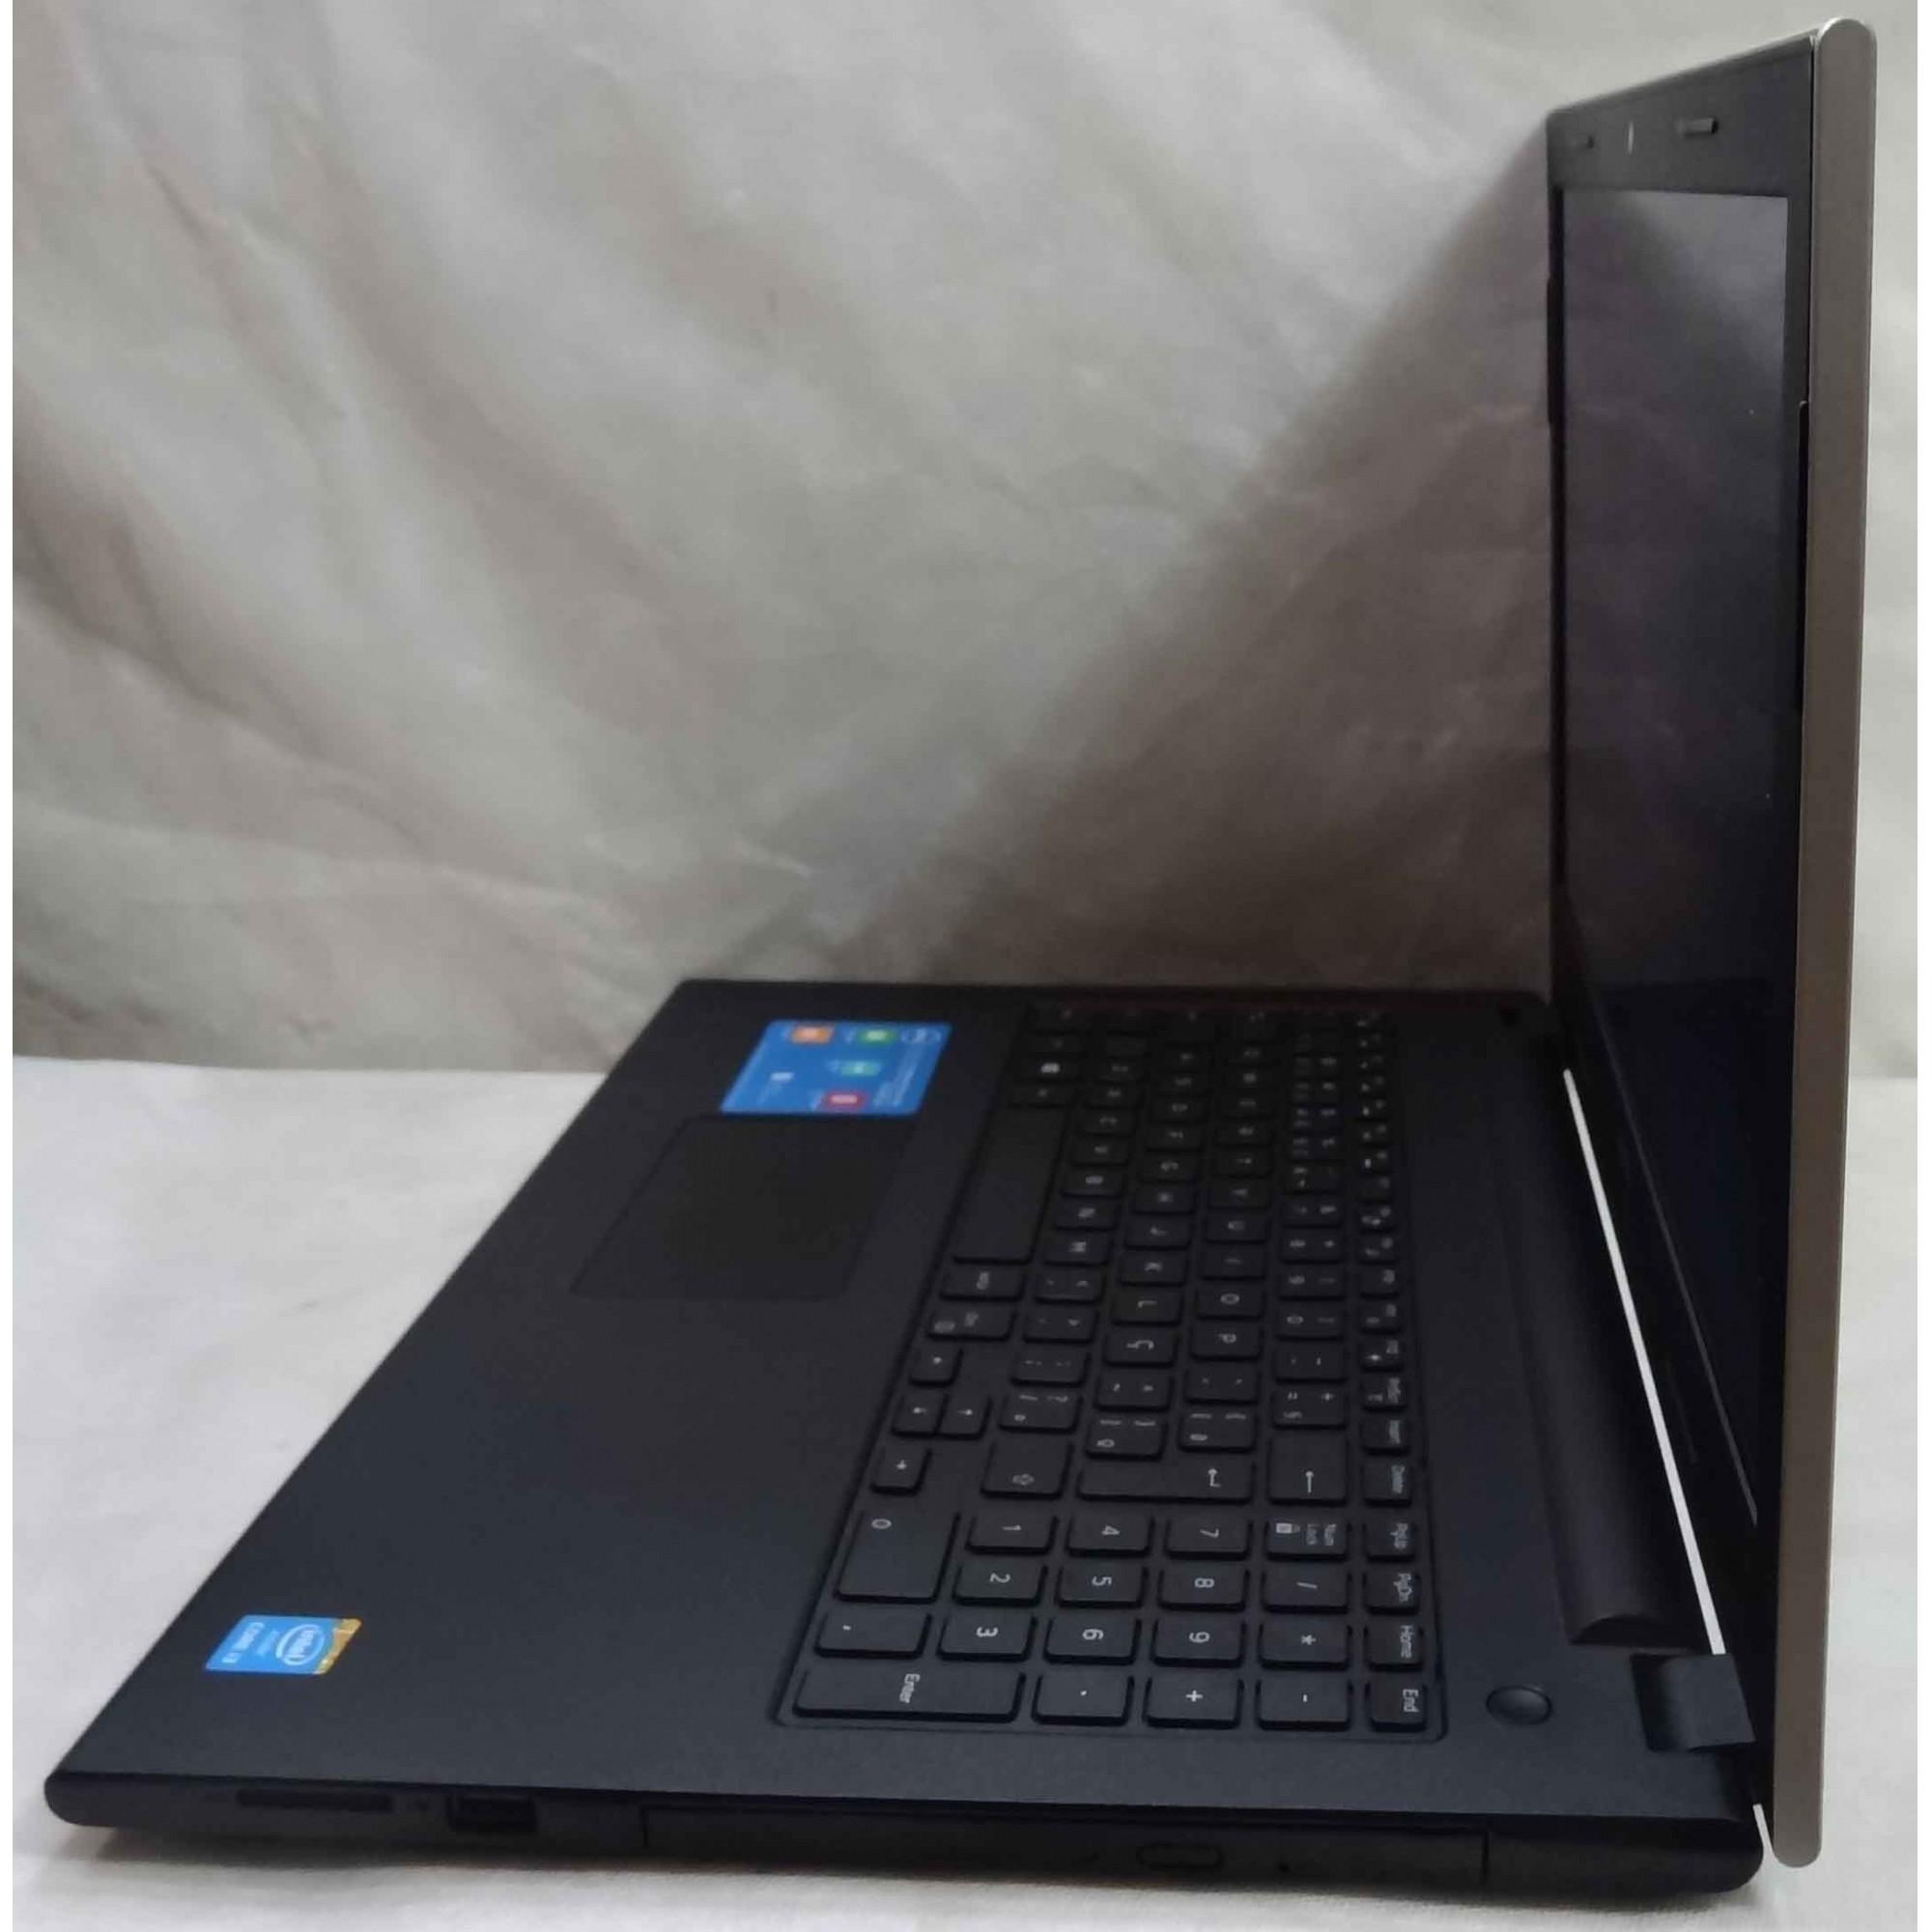 Notebook Dell Inspiron 3542 Intel Core i3 1.7GHz 4GB HD-1TB + Alphanumérico